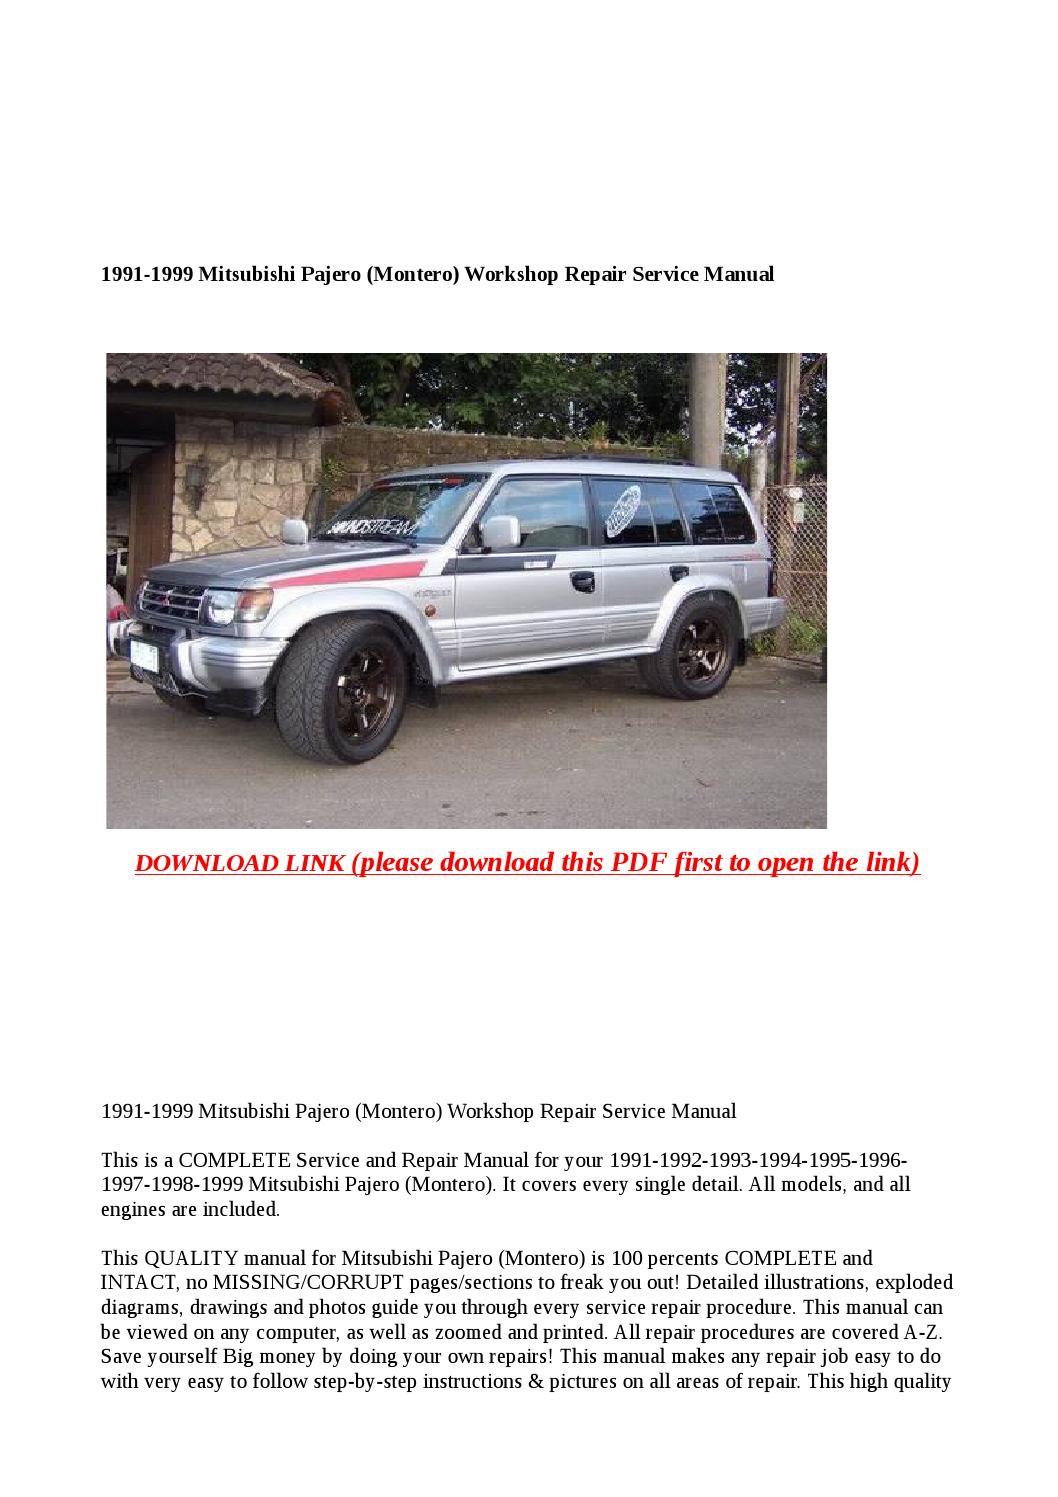 1991 1999 Mitsubishi Pajero Montero Workshop Repair Service Manual By Steve Issuu